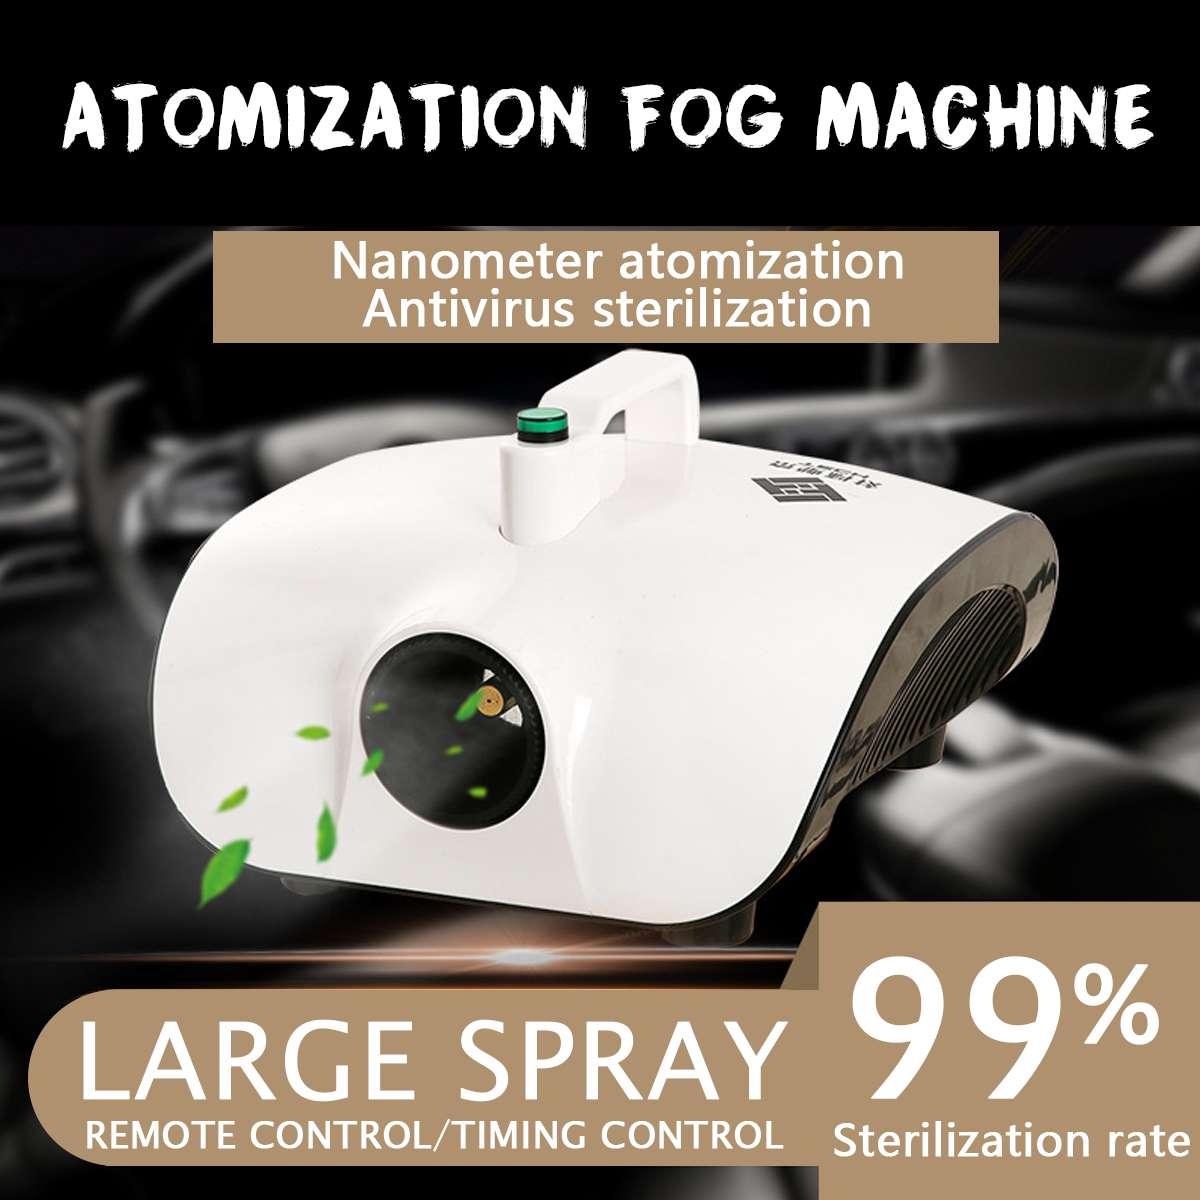 100ml Atomization Machine Deodorant Sterilizes The Formaldehyde Fog Machine Atomizing Bacteria For Indoor Car Home Room